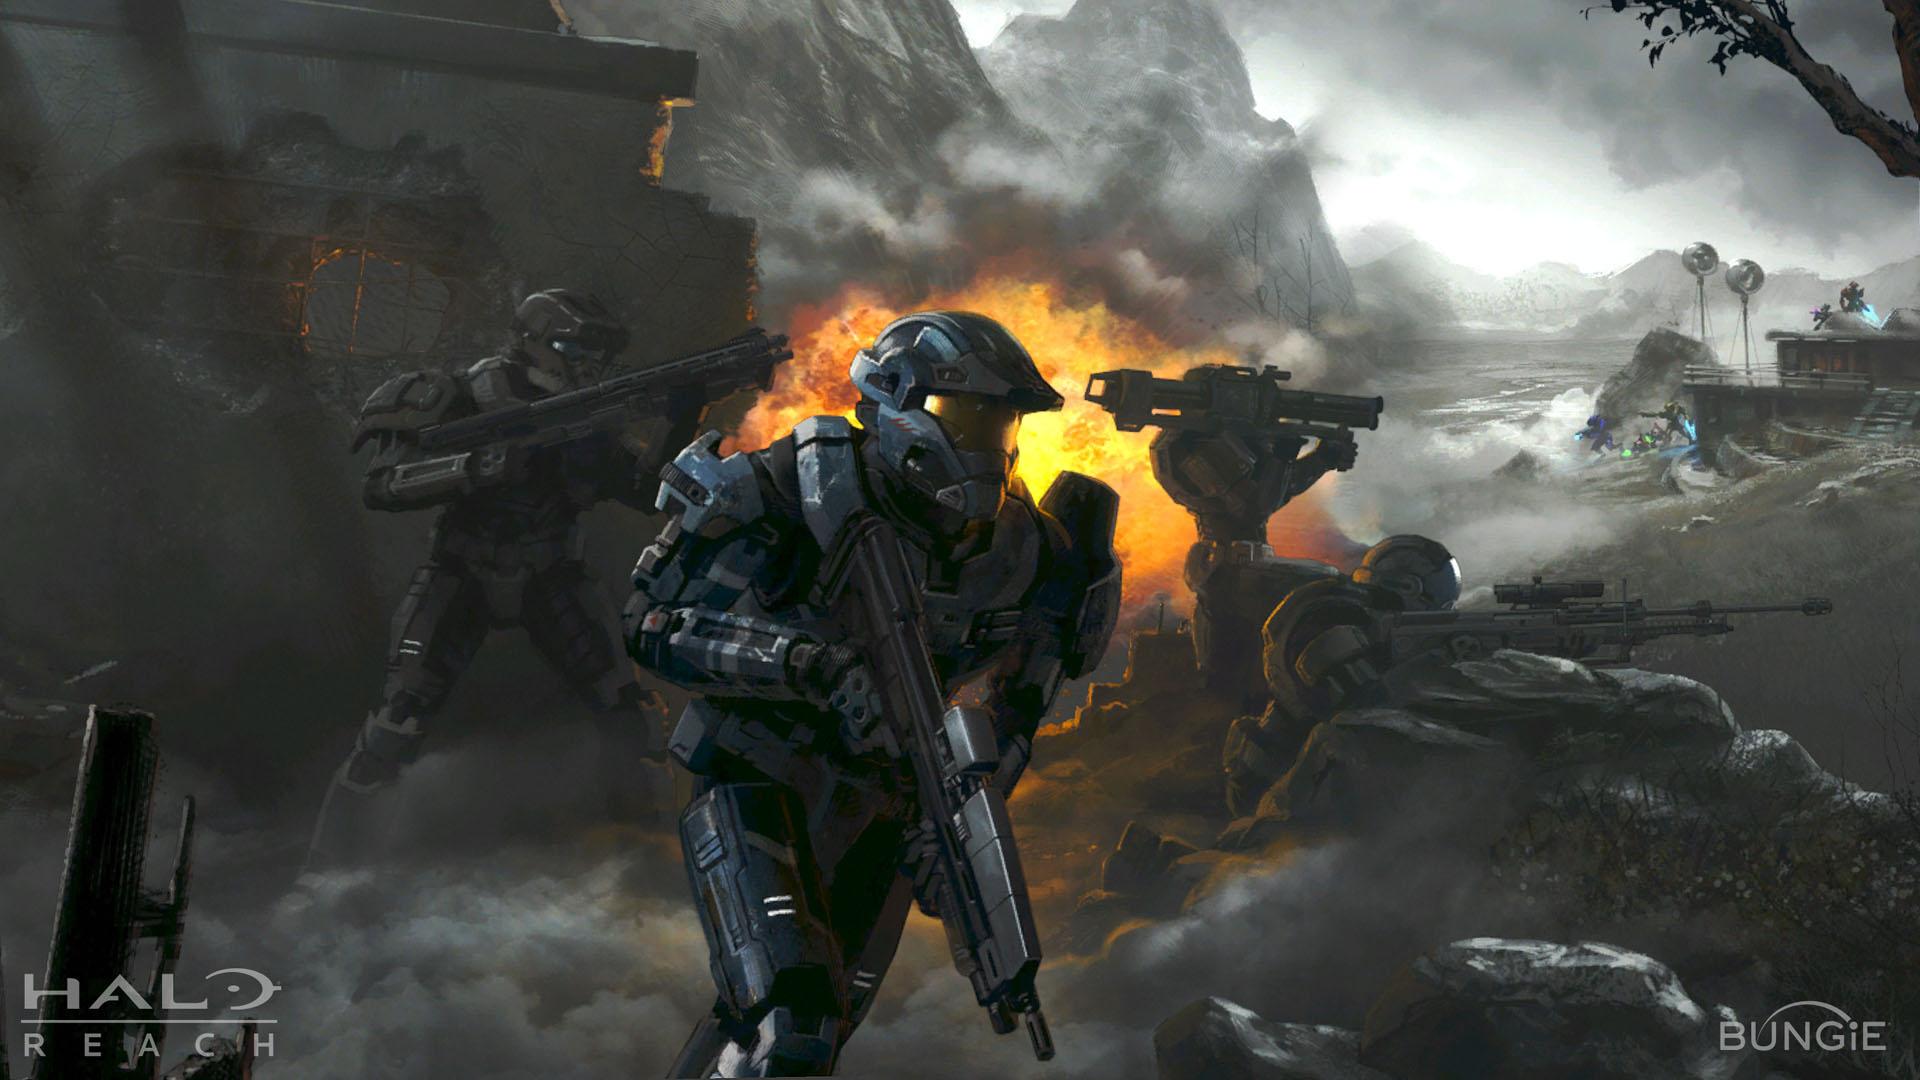 Halo Reach Firefight Wallpaper 378703